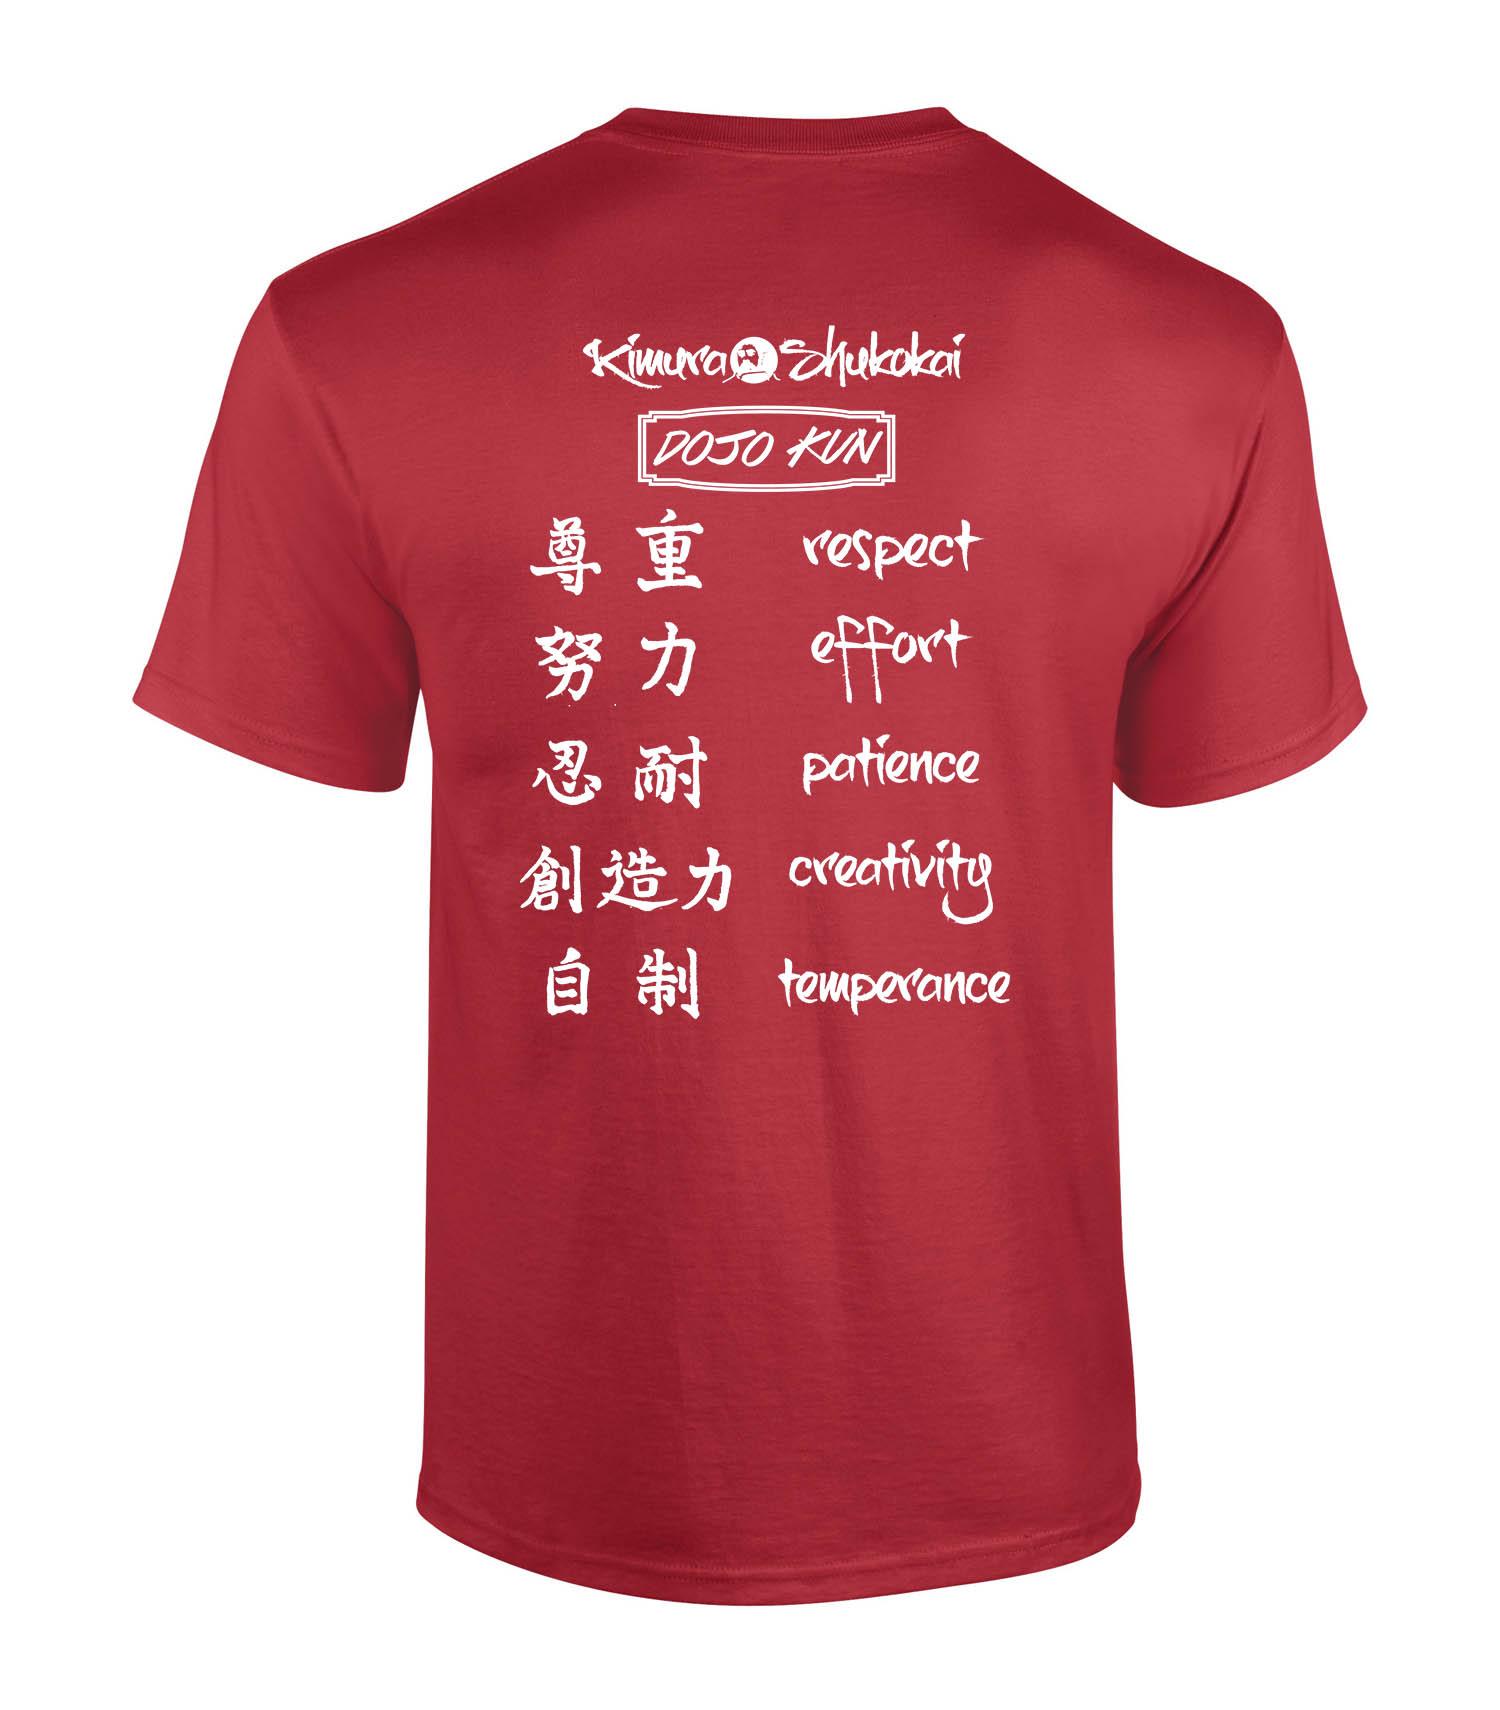 2bc32b7c T Shirt Printing Design Maker - DREAMWORKS